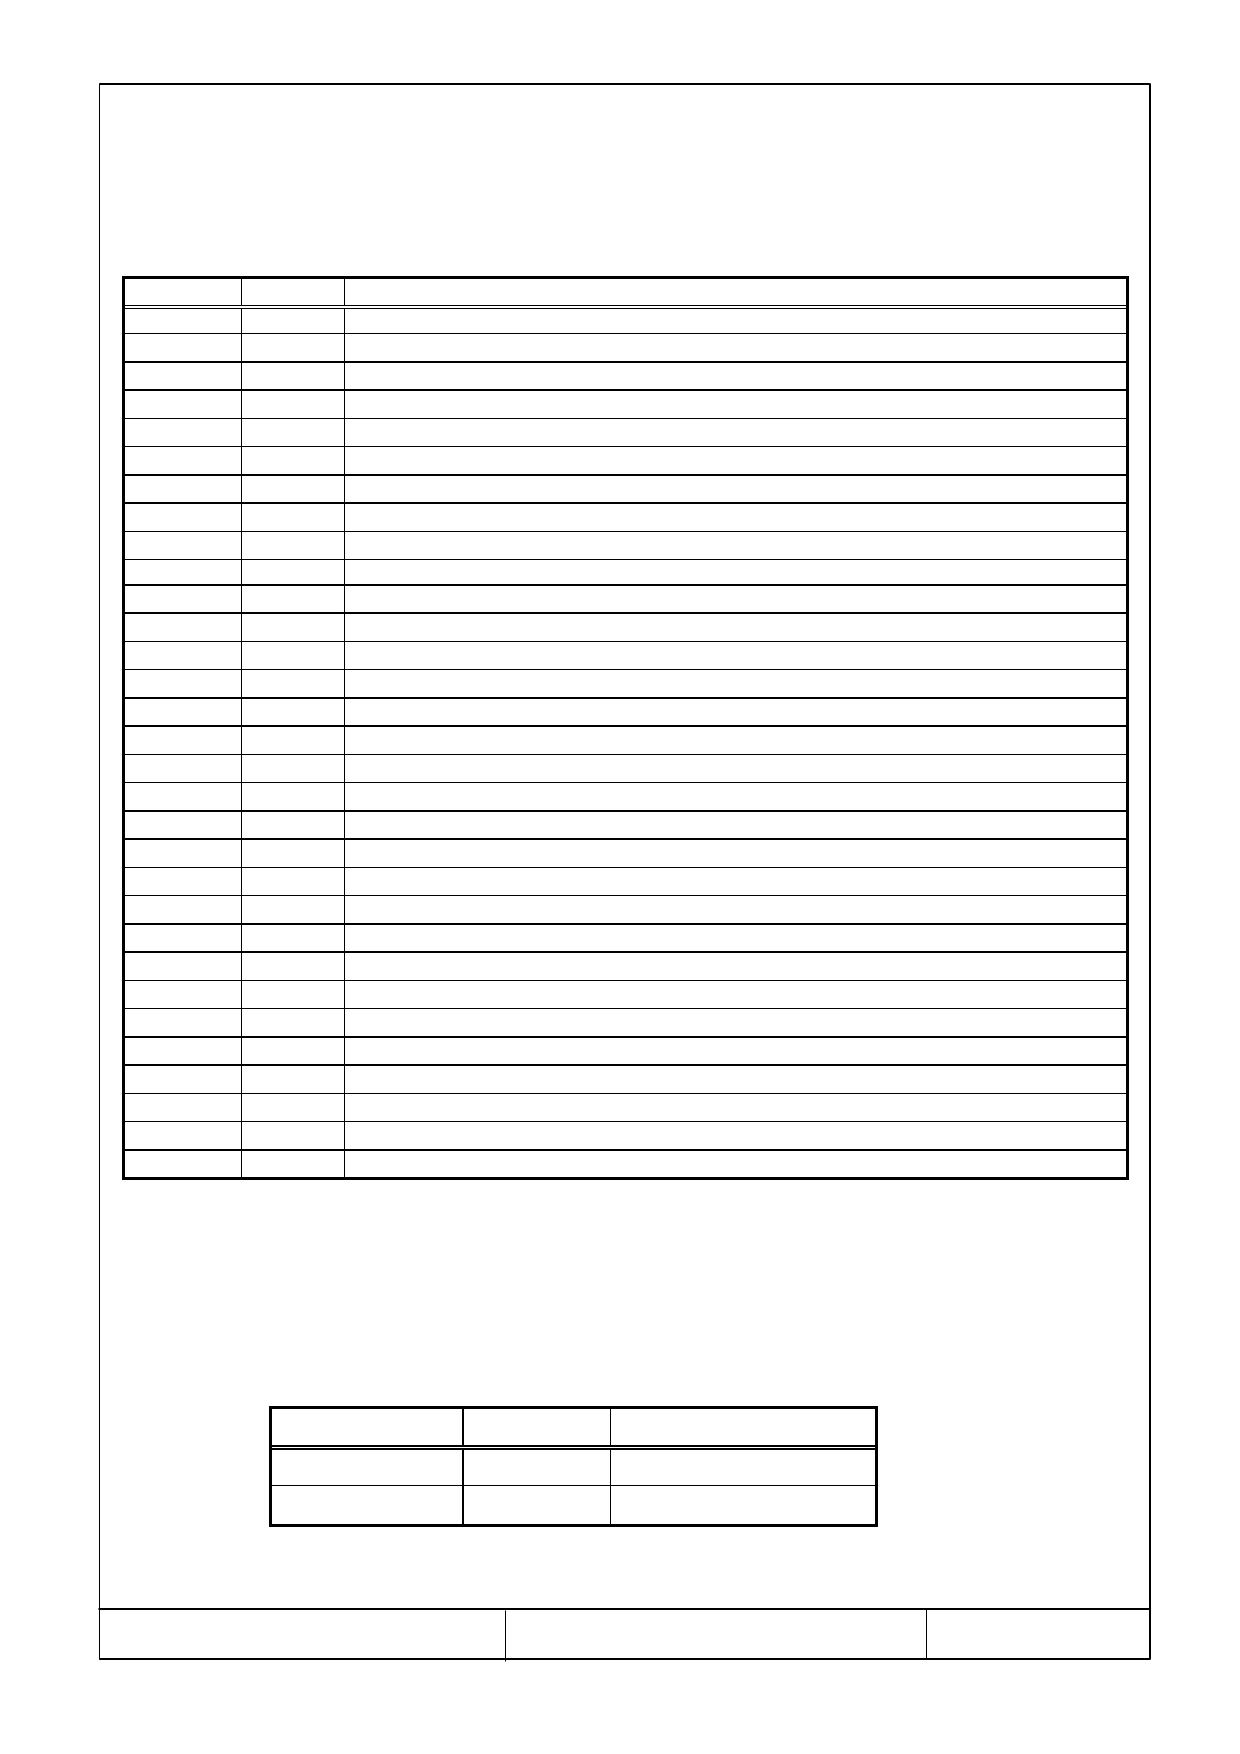 T-51638D084-FW-A-AA pdf